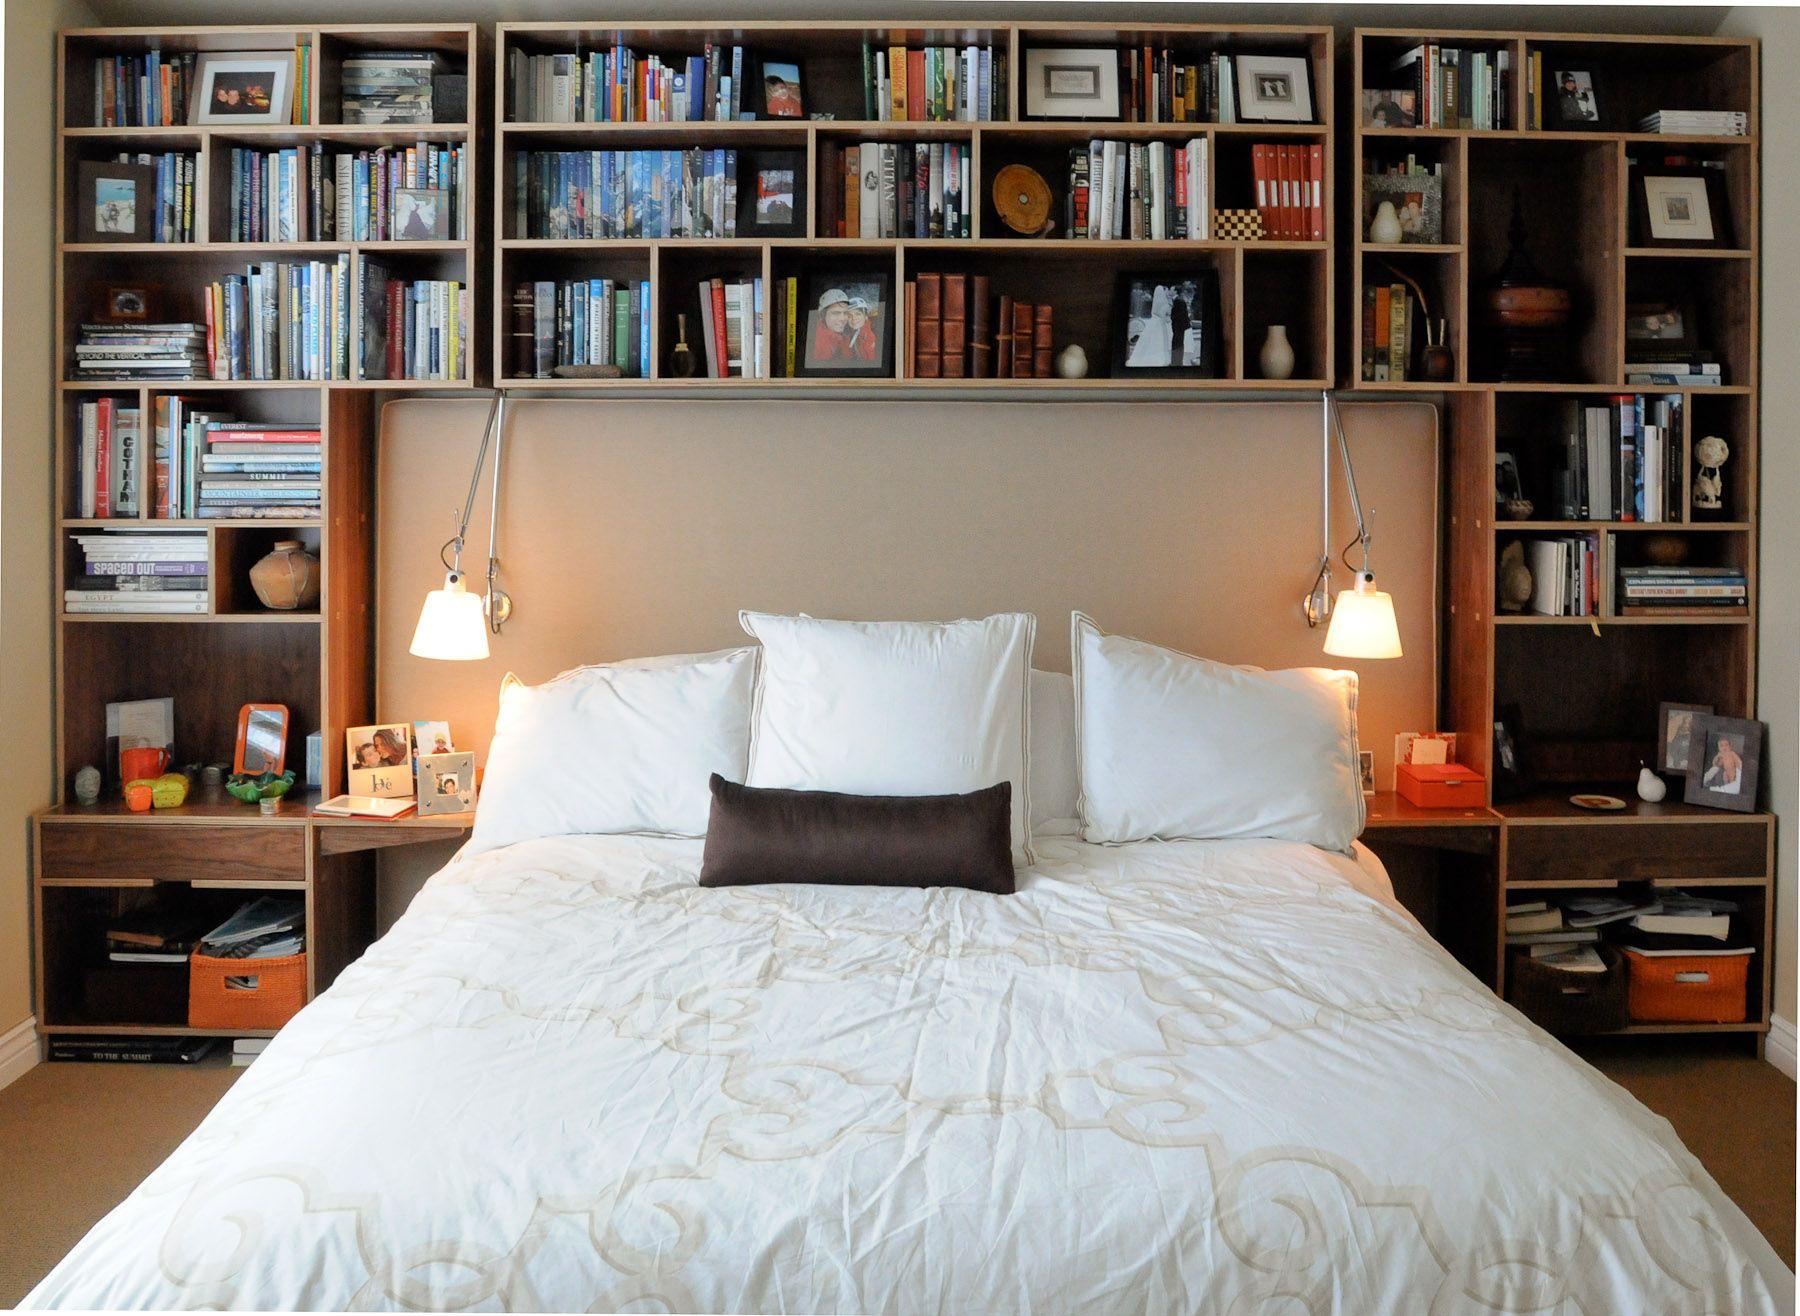 bedroom bookcases johns bedroom bookcase bookshelves bedroom johns